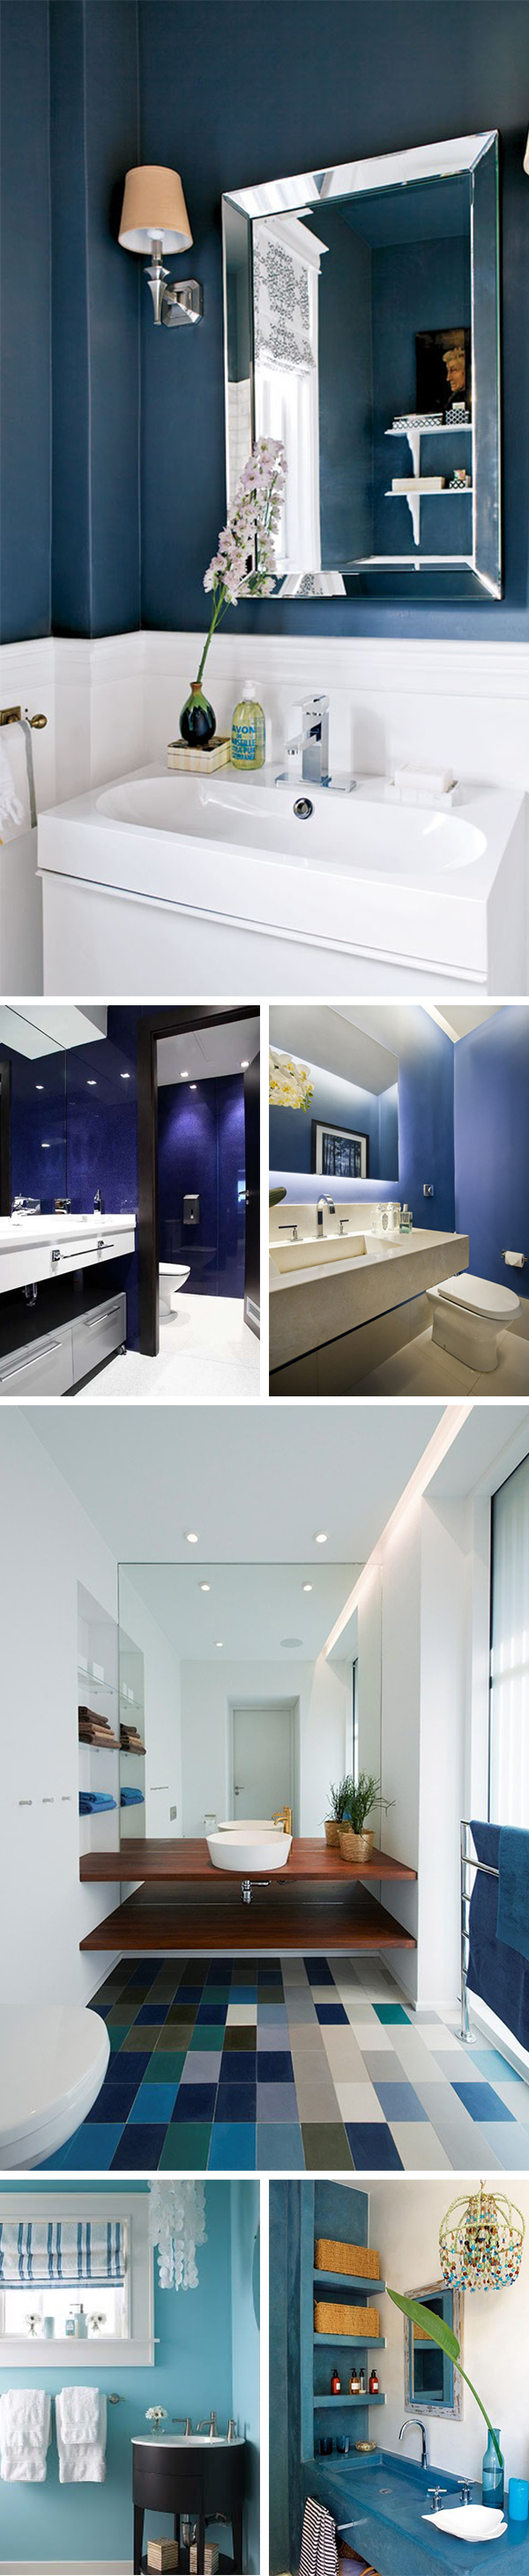 Lavabo azul 3